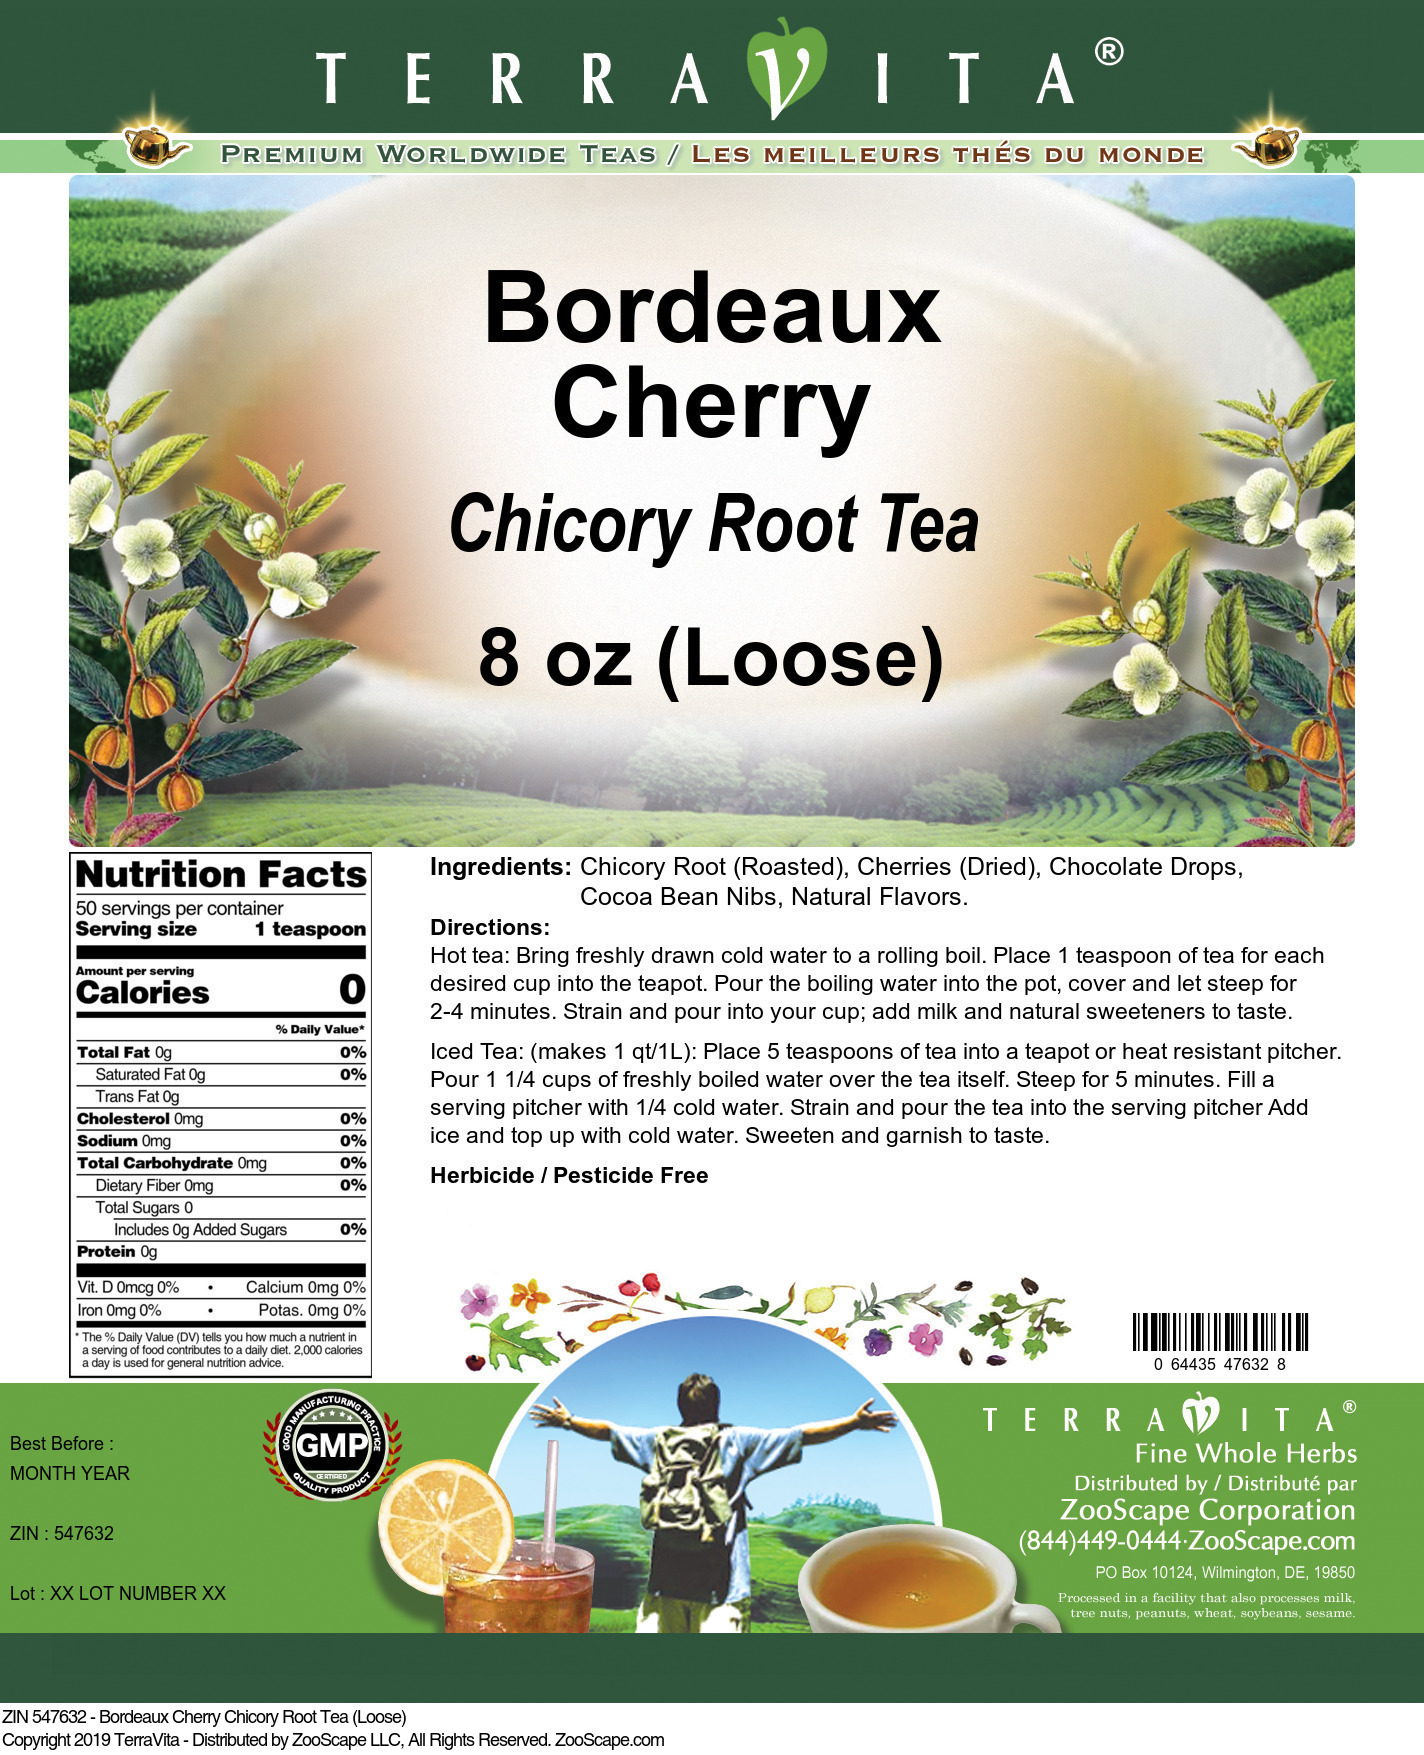 Bordeaux Cherry Chicory Root